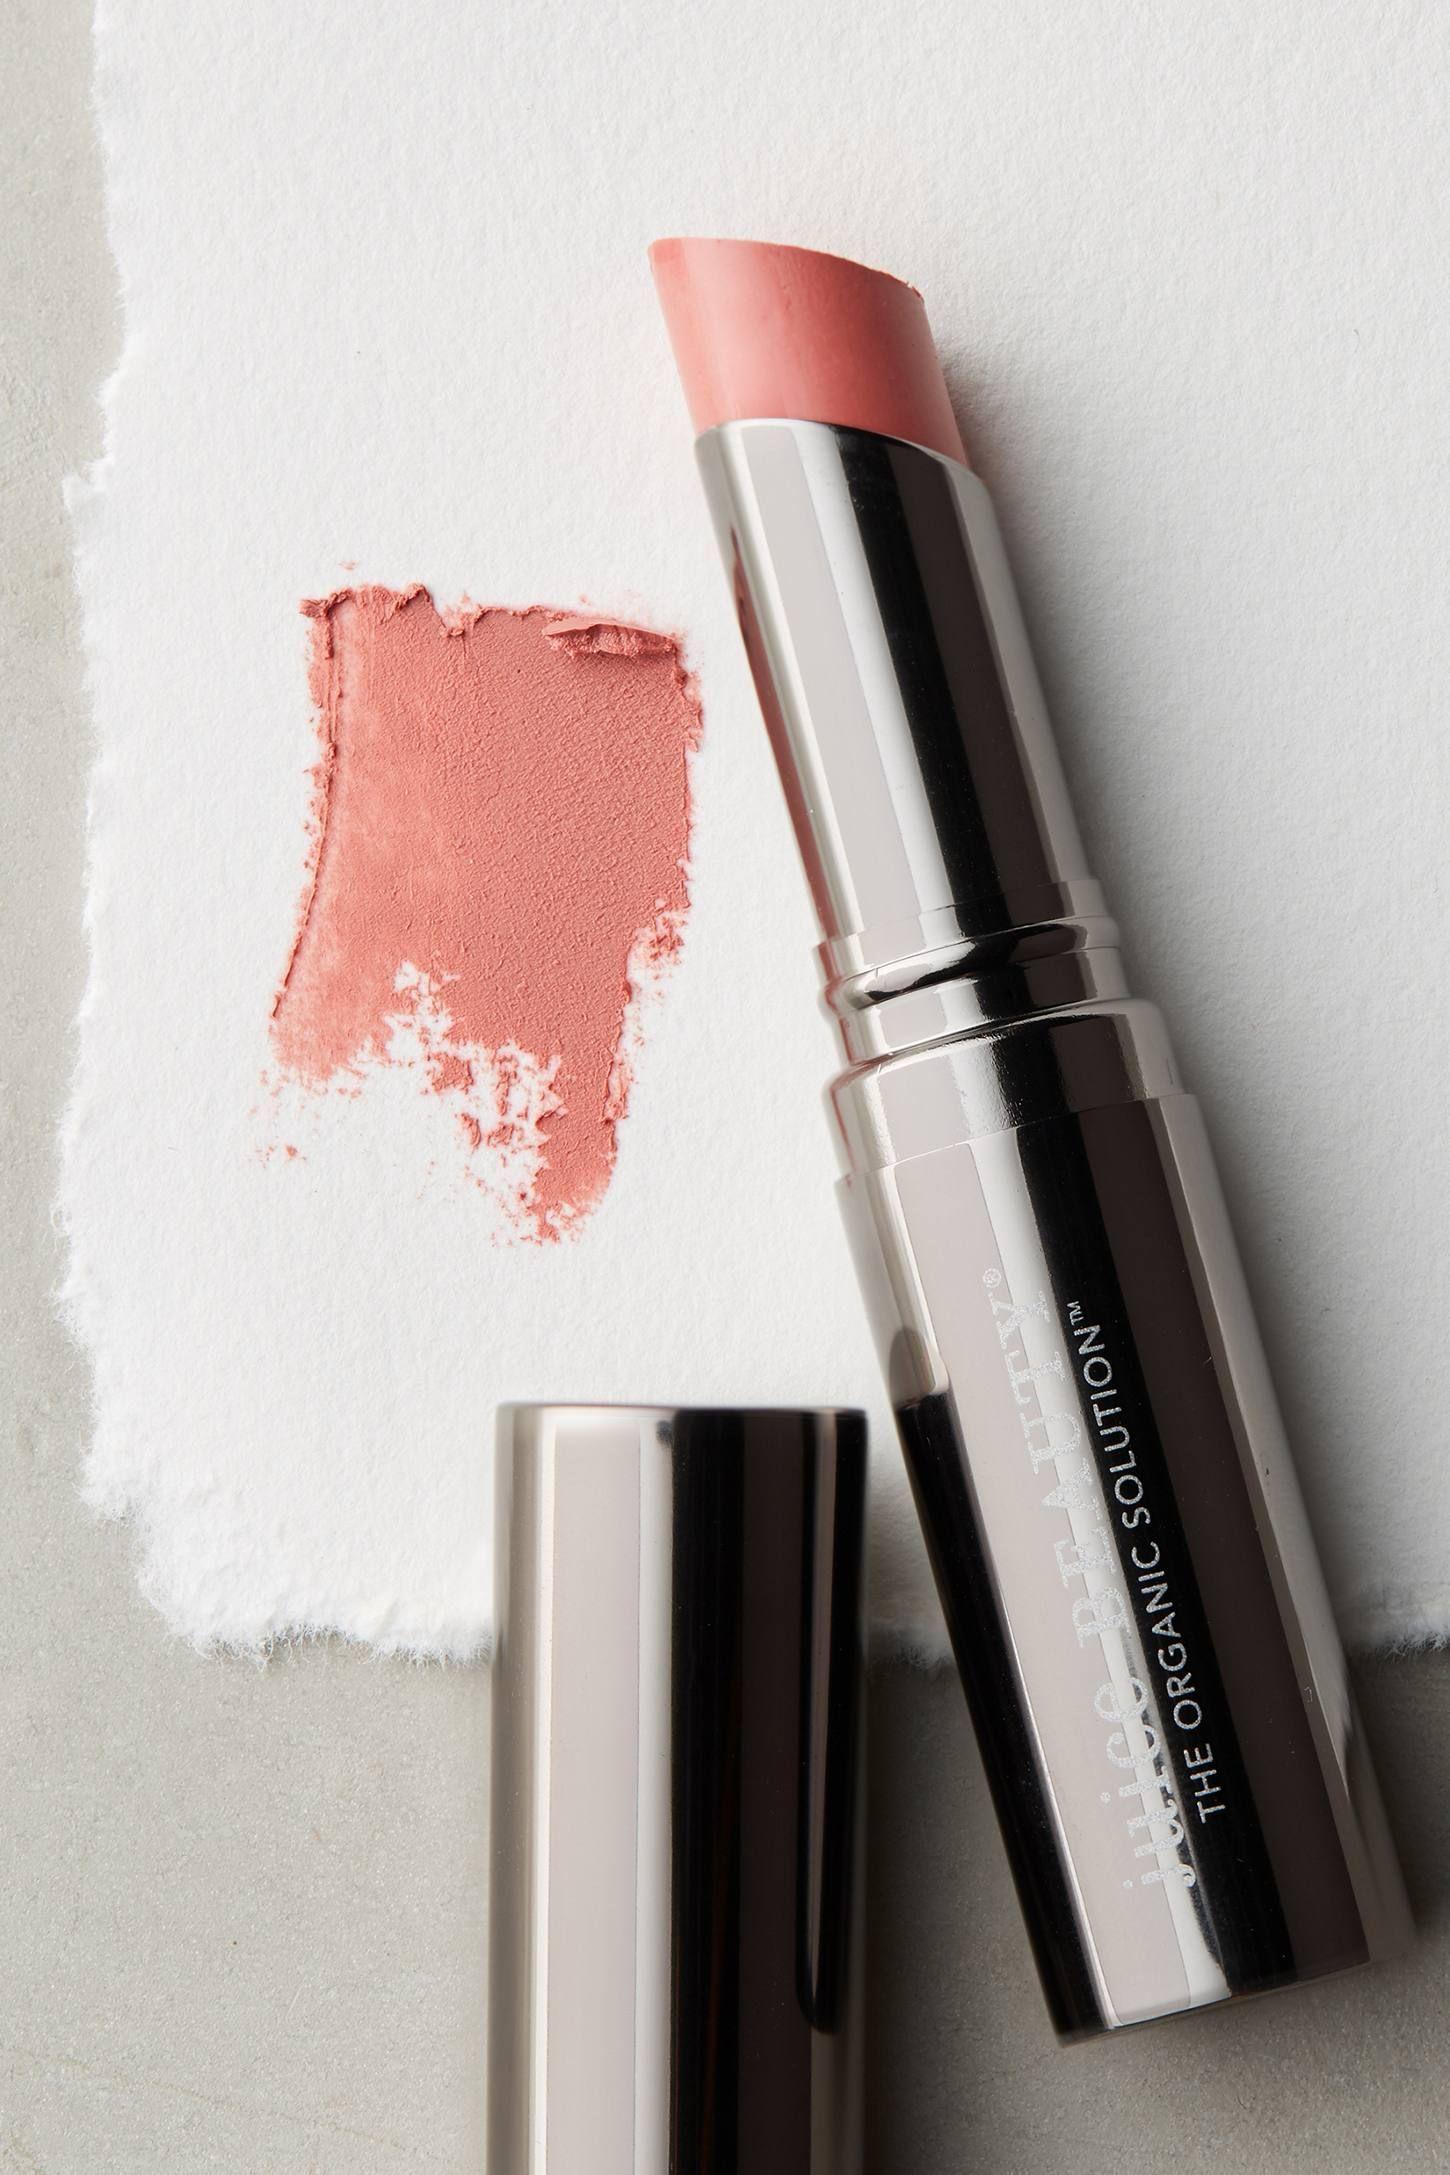 Photo of Juice Beauty Phyto-Pigments Satin Lip Cream